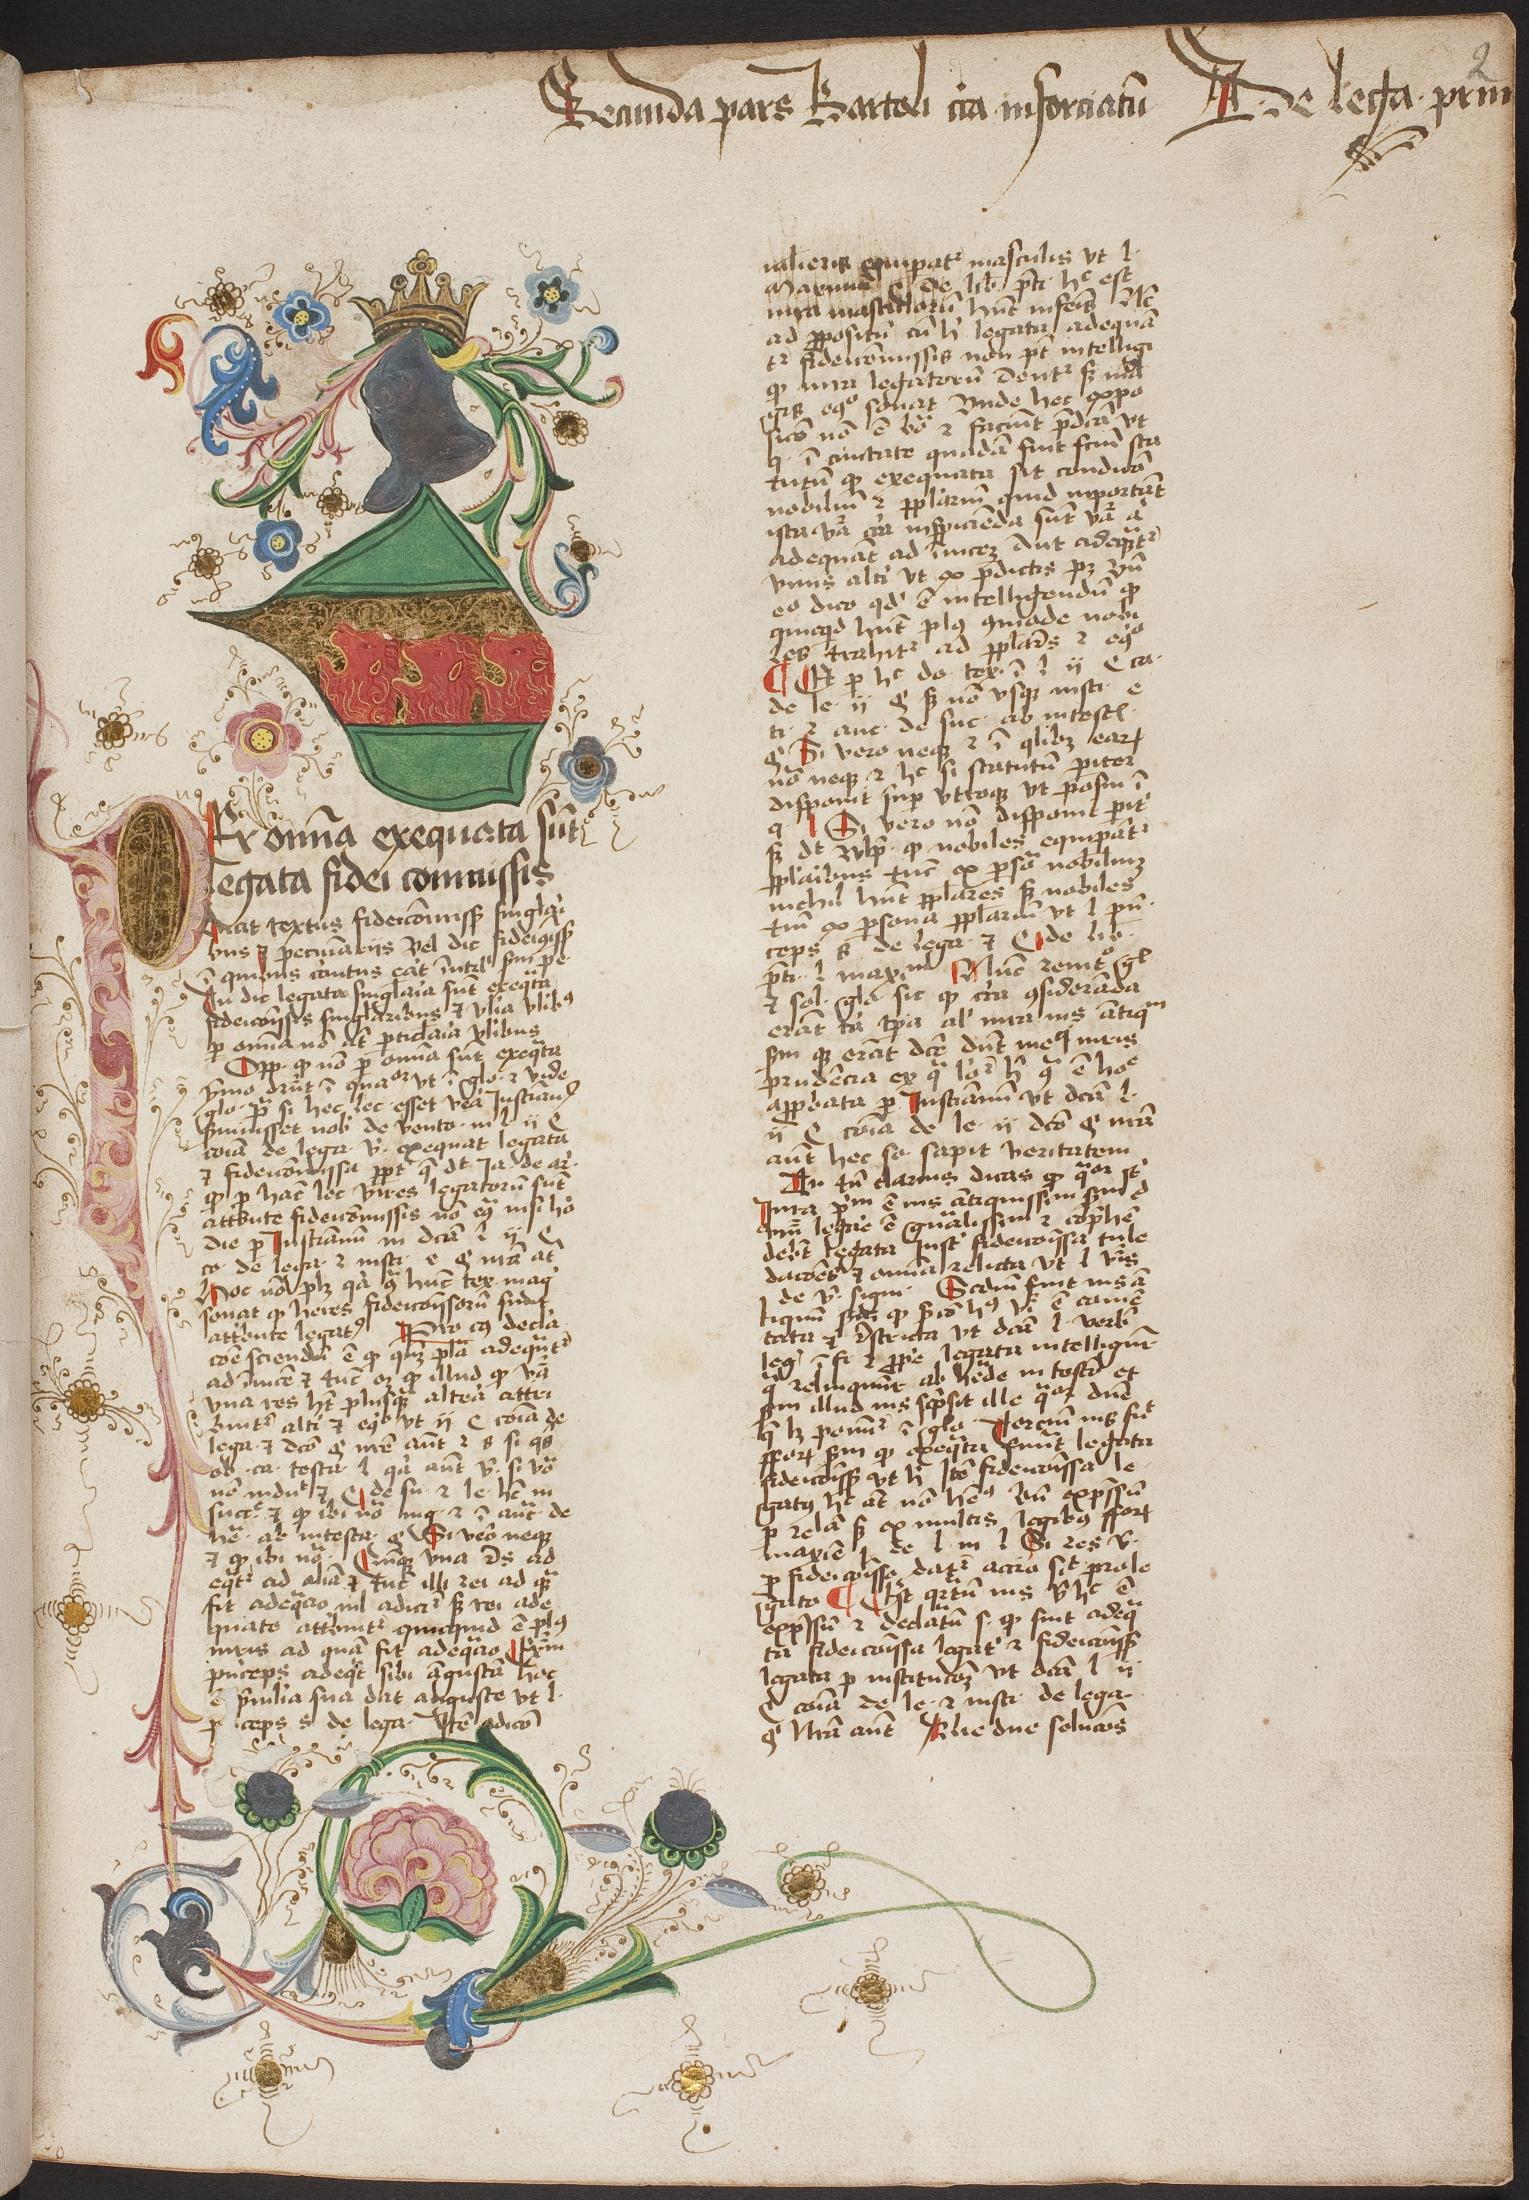 Handschrift: Ms. Mag. 35, fol. 2r